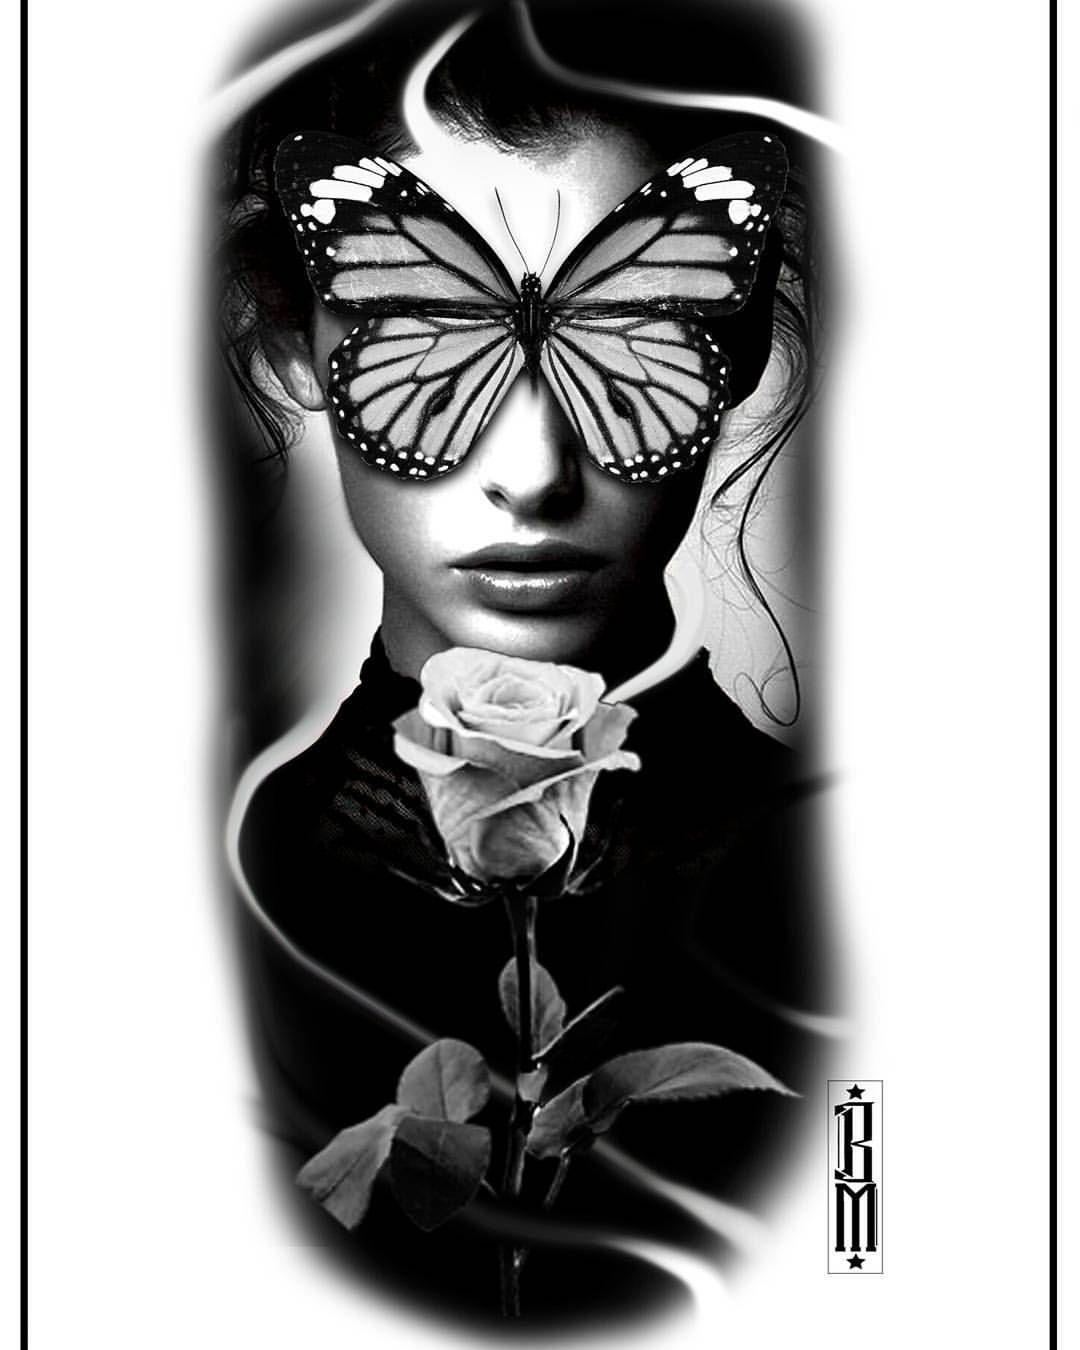 butterfly rose face women design tattoo blackandwhite madhouse tattoo pinterest. Black Bedroom Furniture Sets. Home Design Ideas